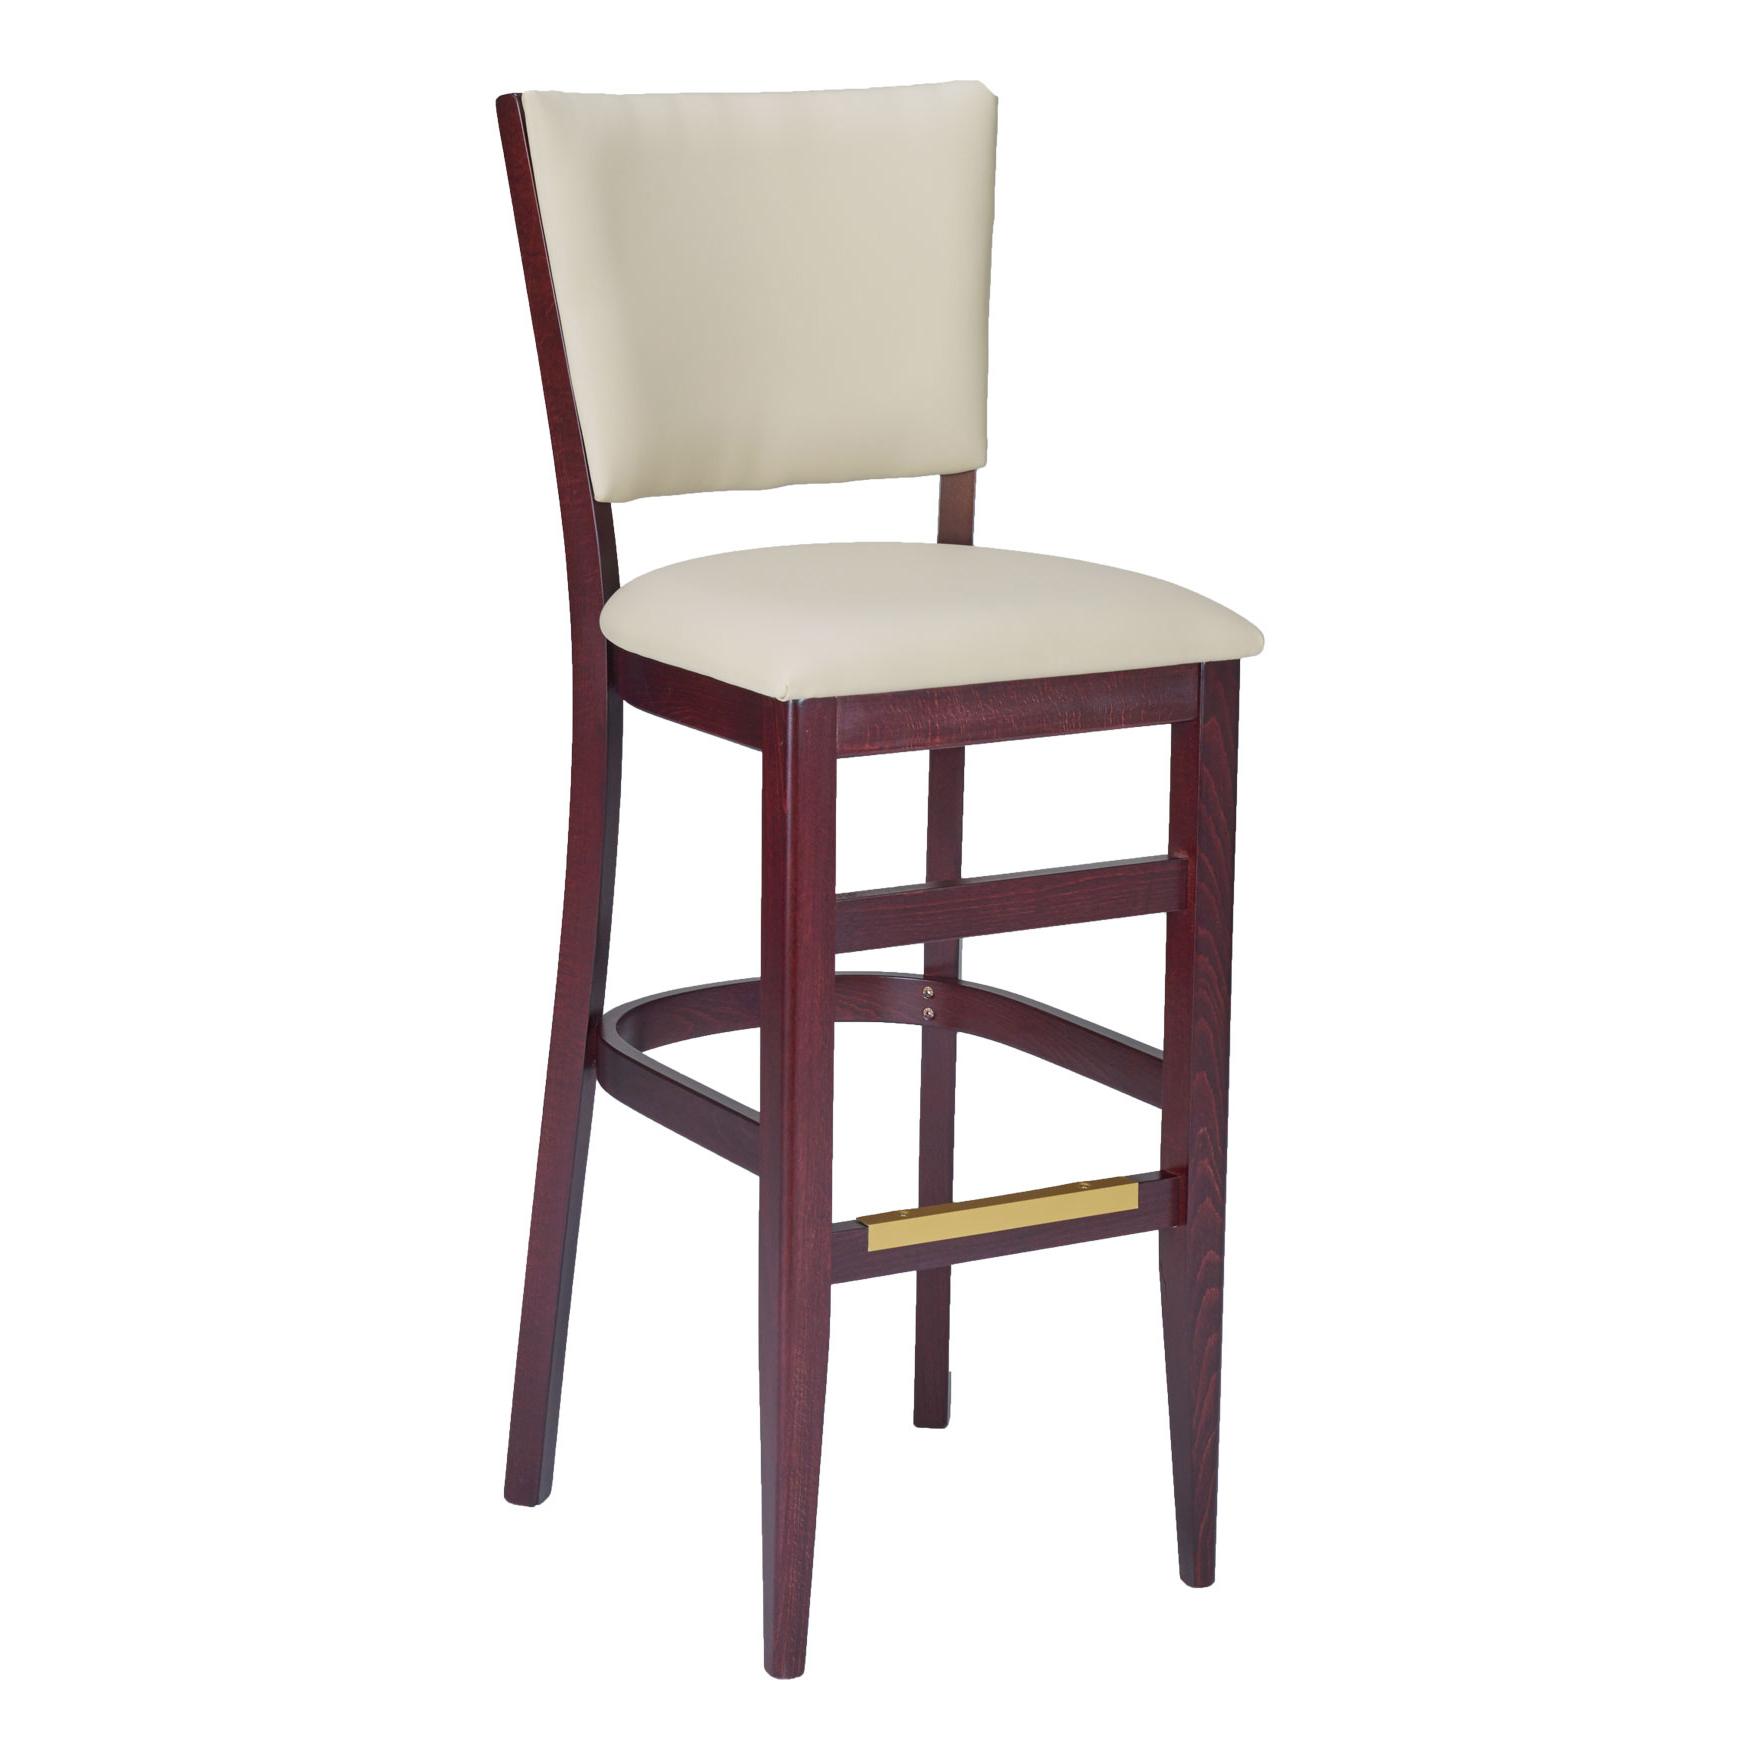 Florida Seating RV-MONTERO B GR5 bar stool, indoor